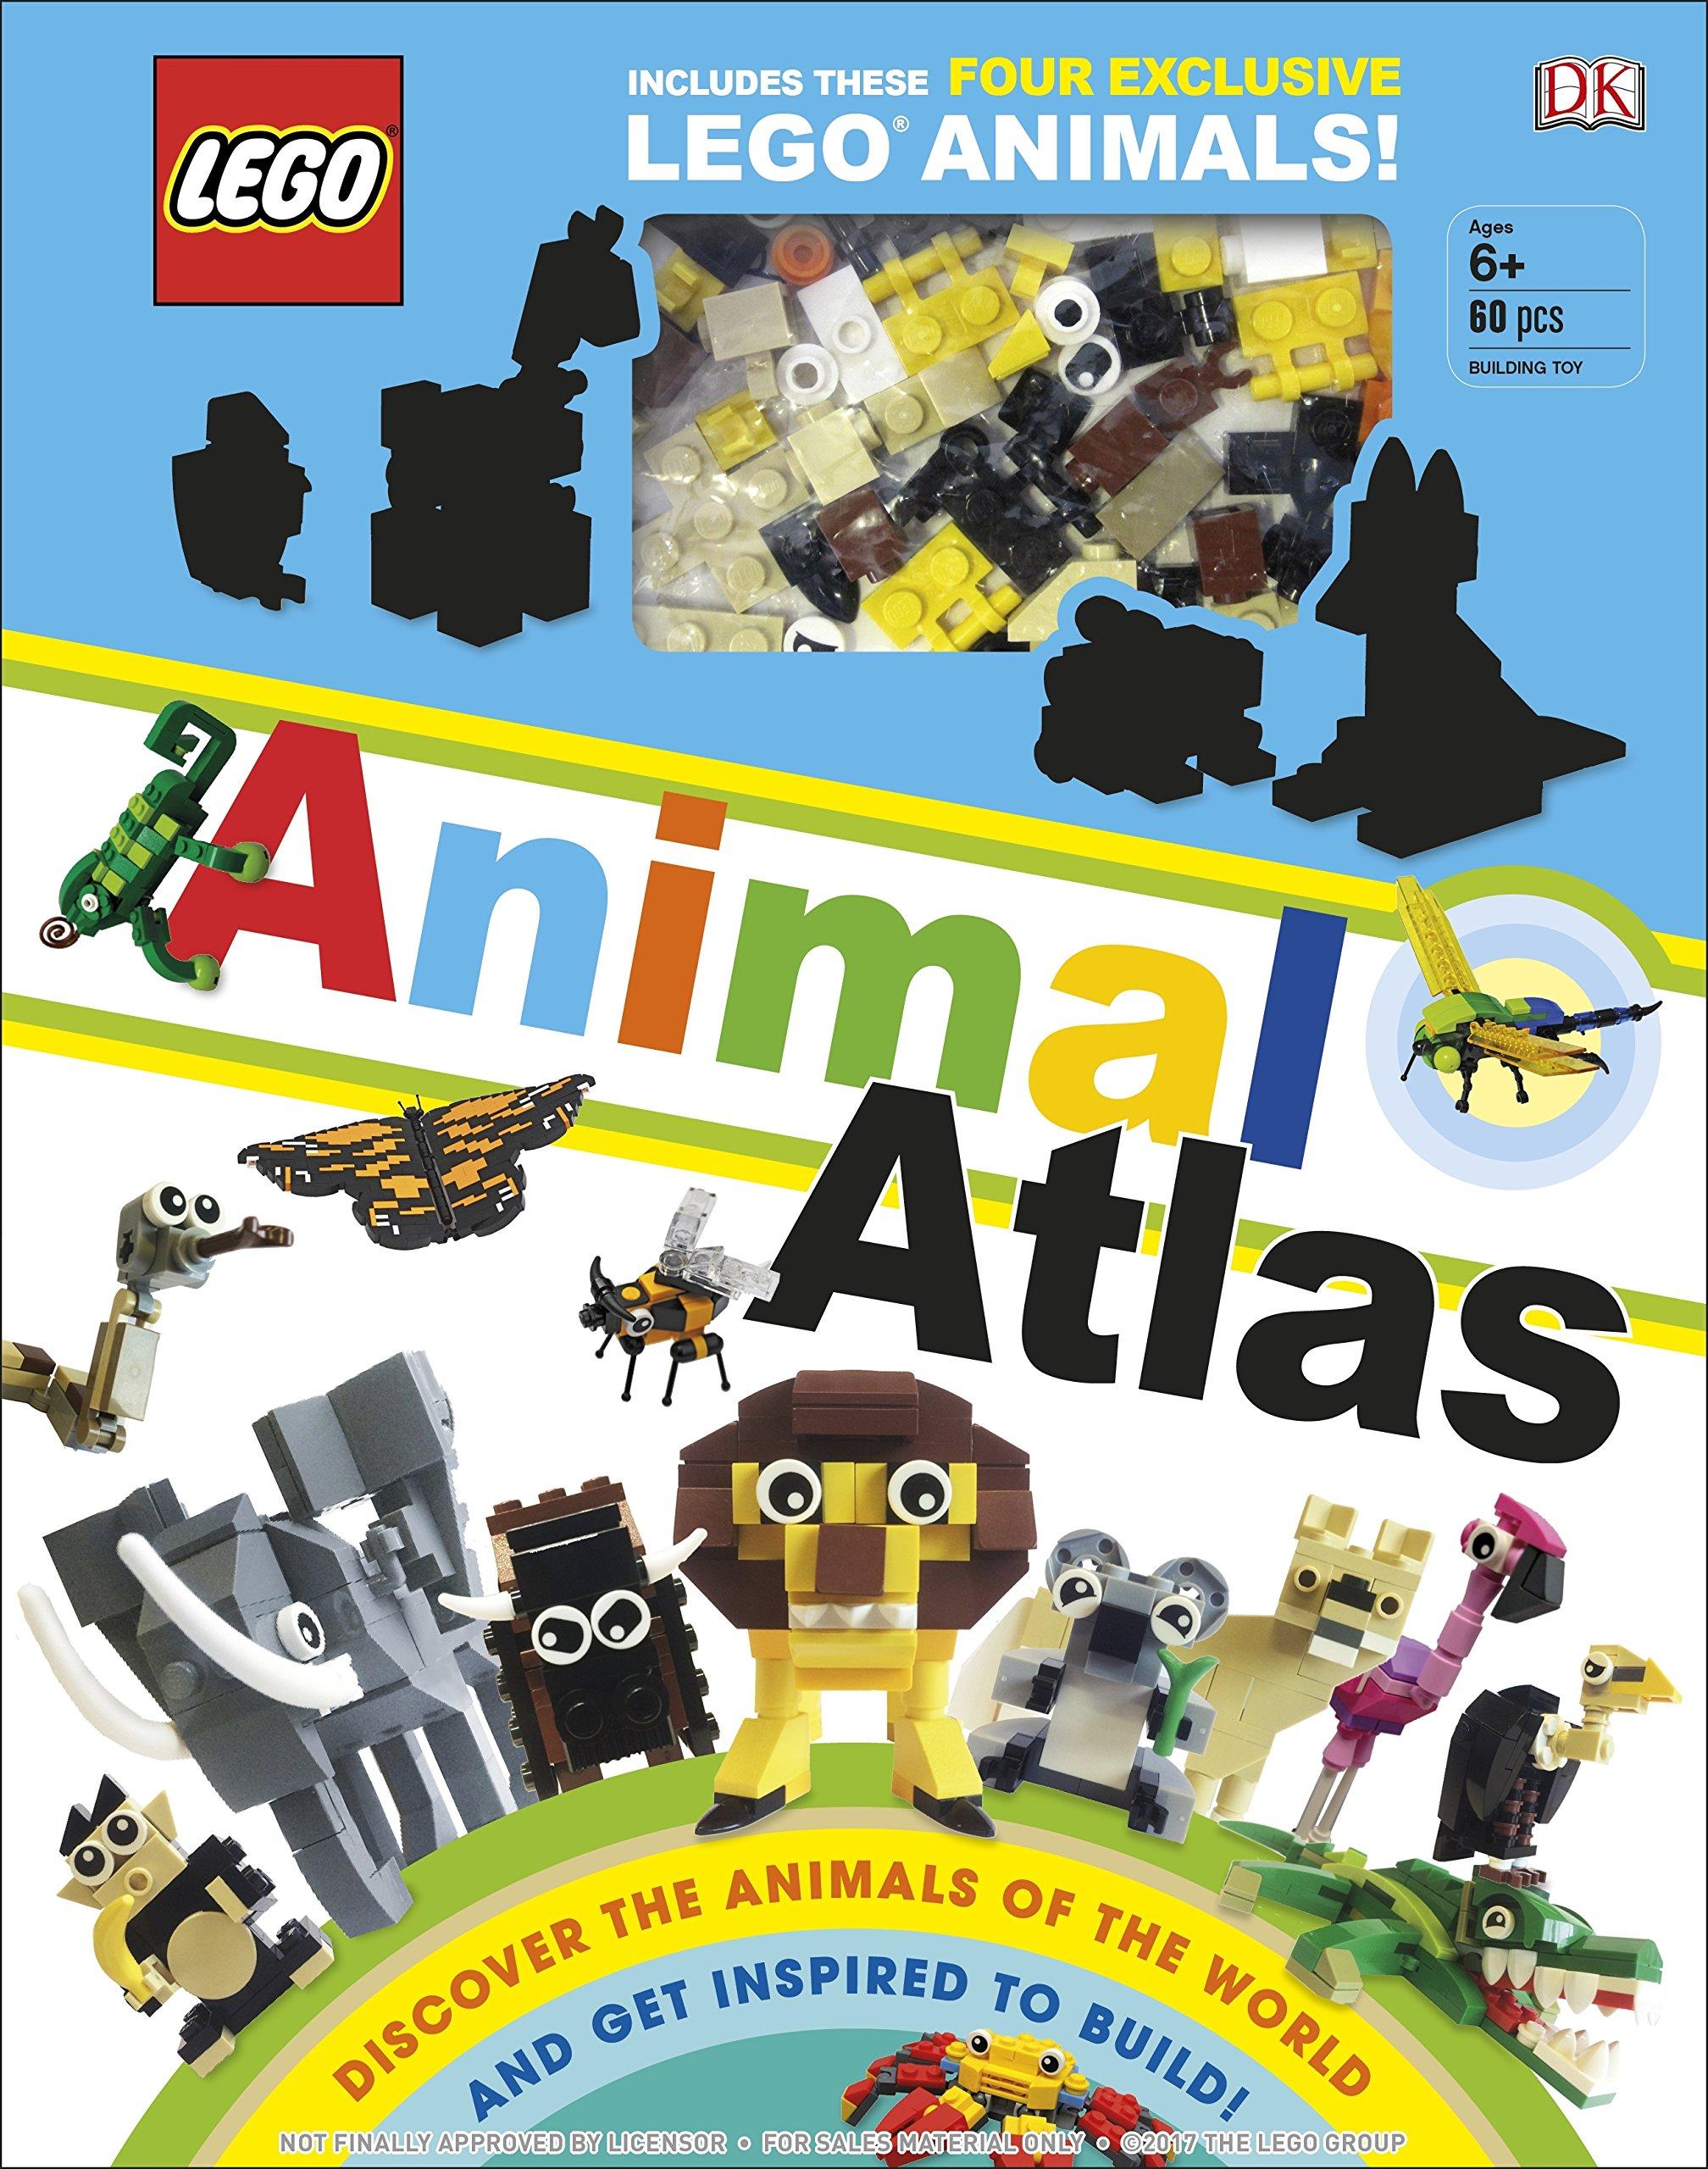 LEGO White Clam Animal Piece